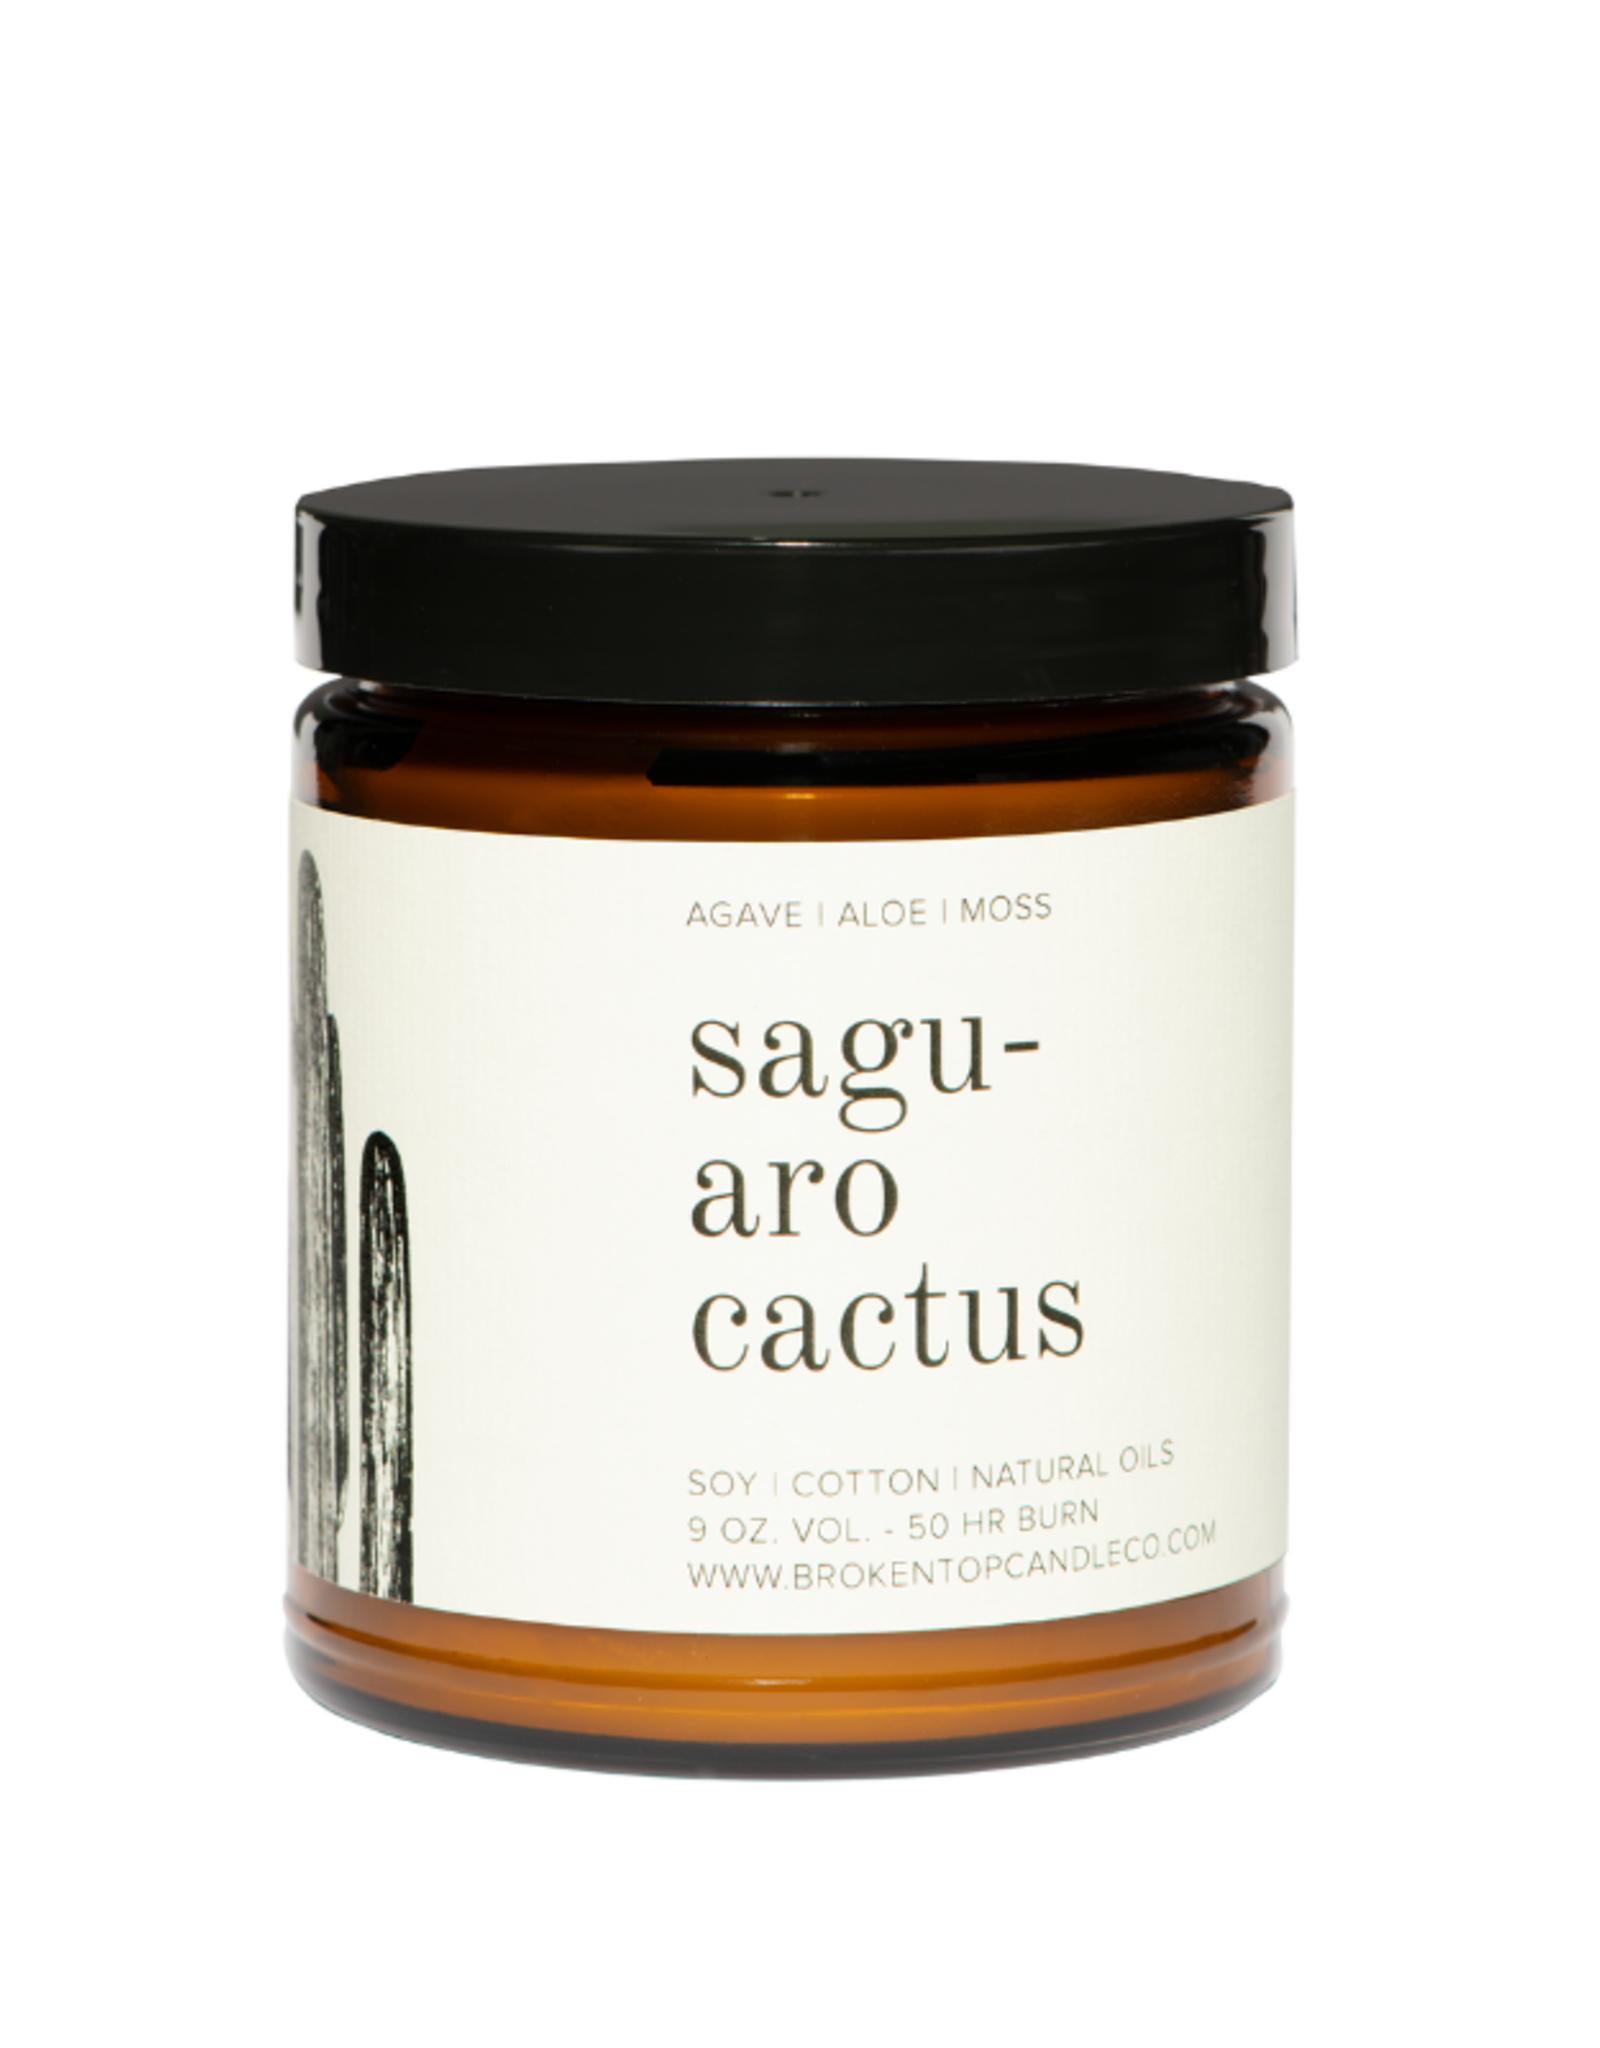 Broken Top Candle Bougie - Saguaro cactus - 50h